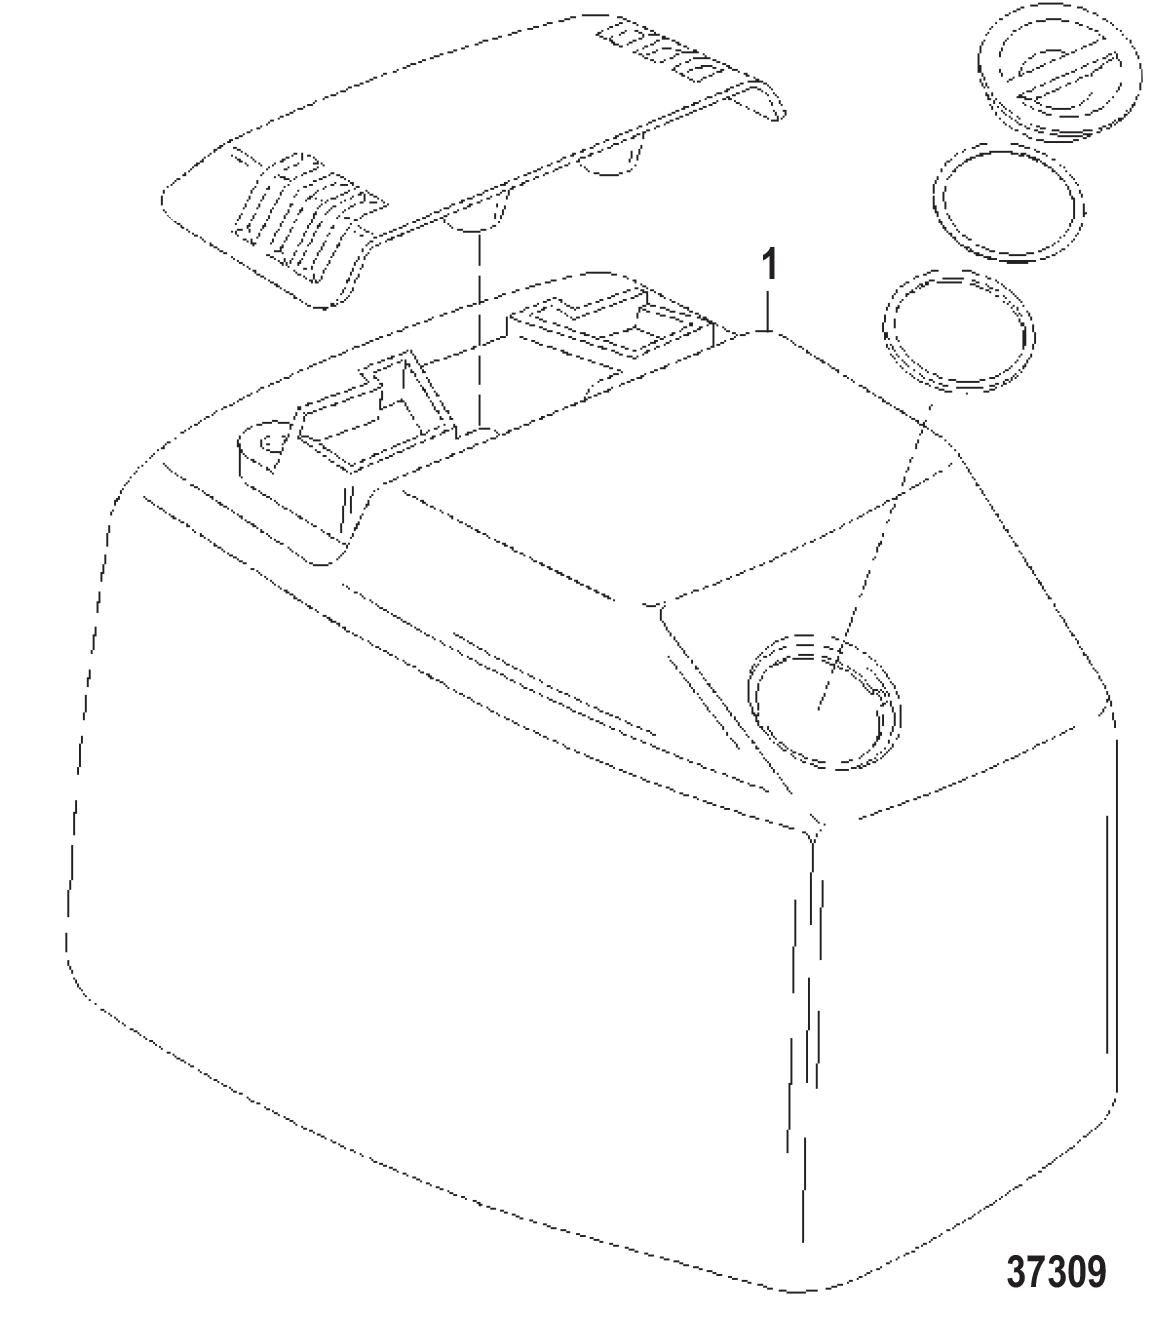 2000 Mariner 40 Hp - Wiring Diagram Database - 40 Hp Mercury Outboard Wiring Diagram